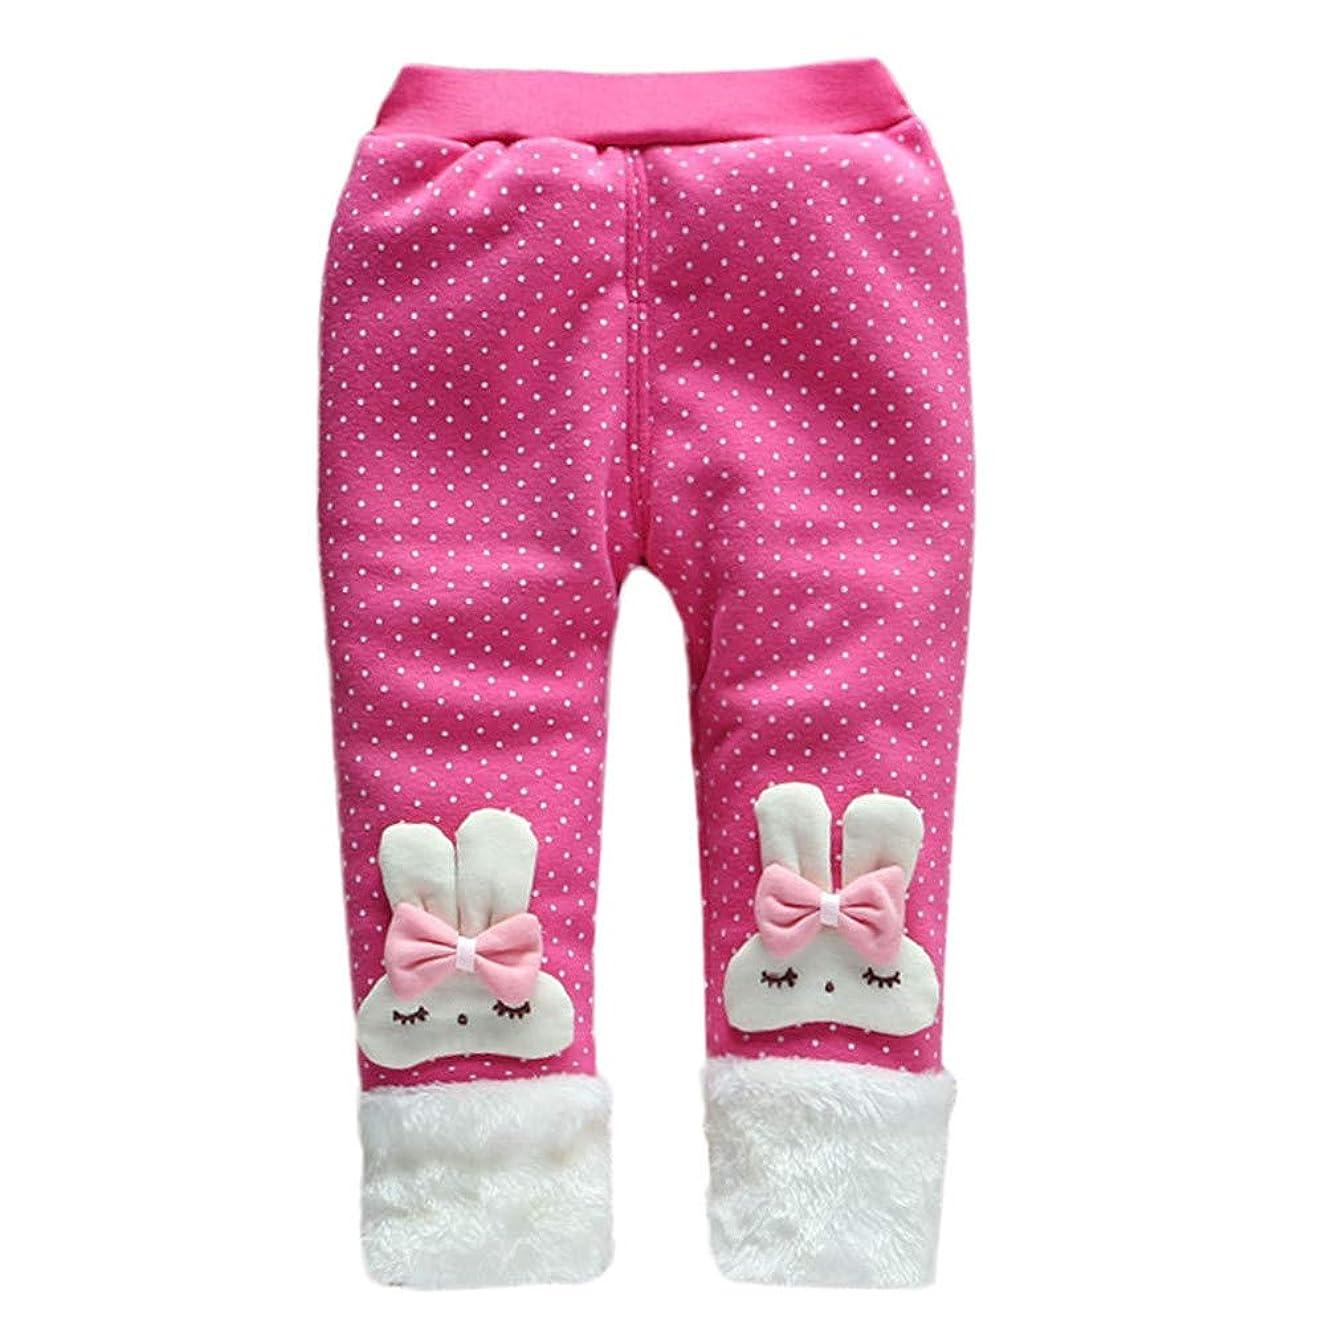 XUANOU Trendy Leg Warmer Baby Girl Pants Child Cartoon Bowknot Pants Trousers Le